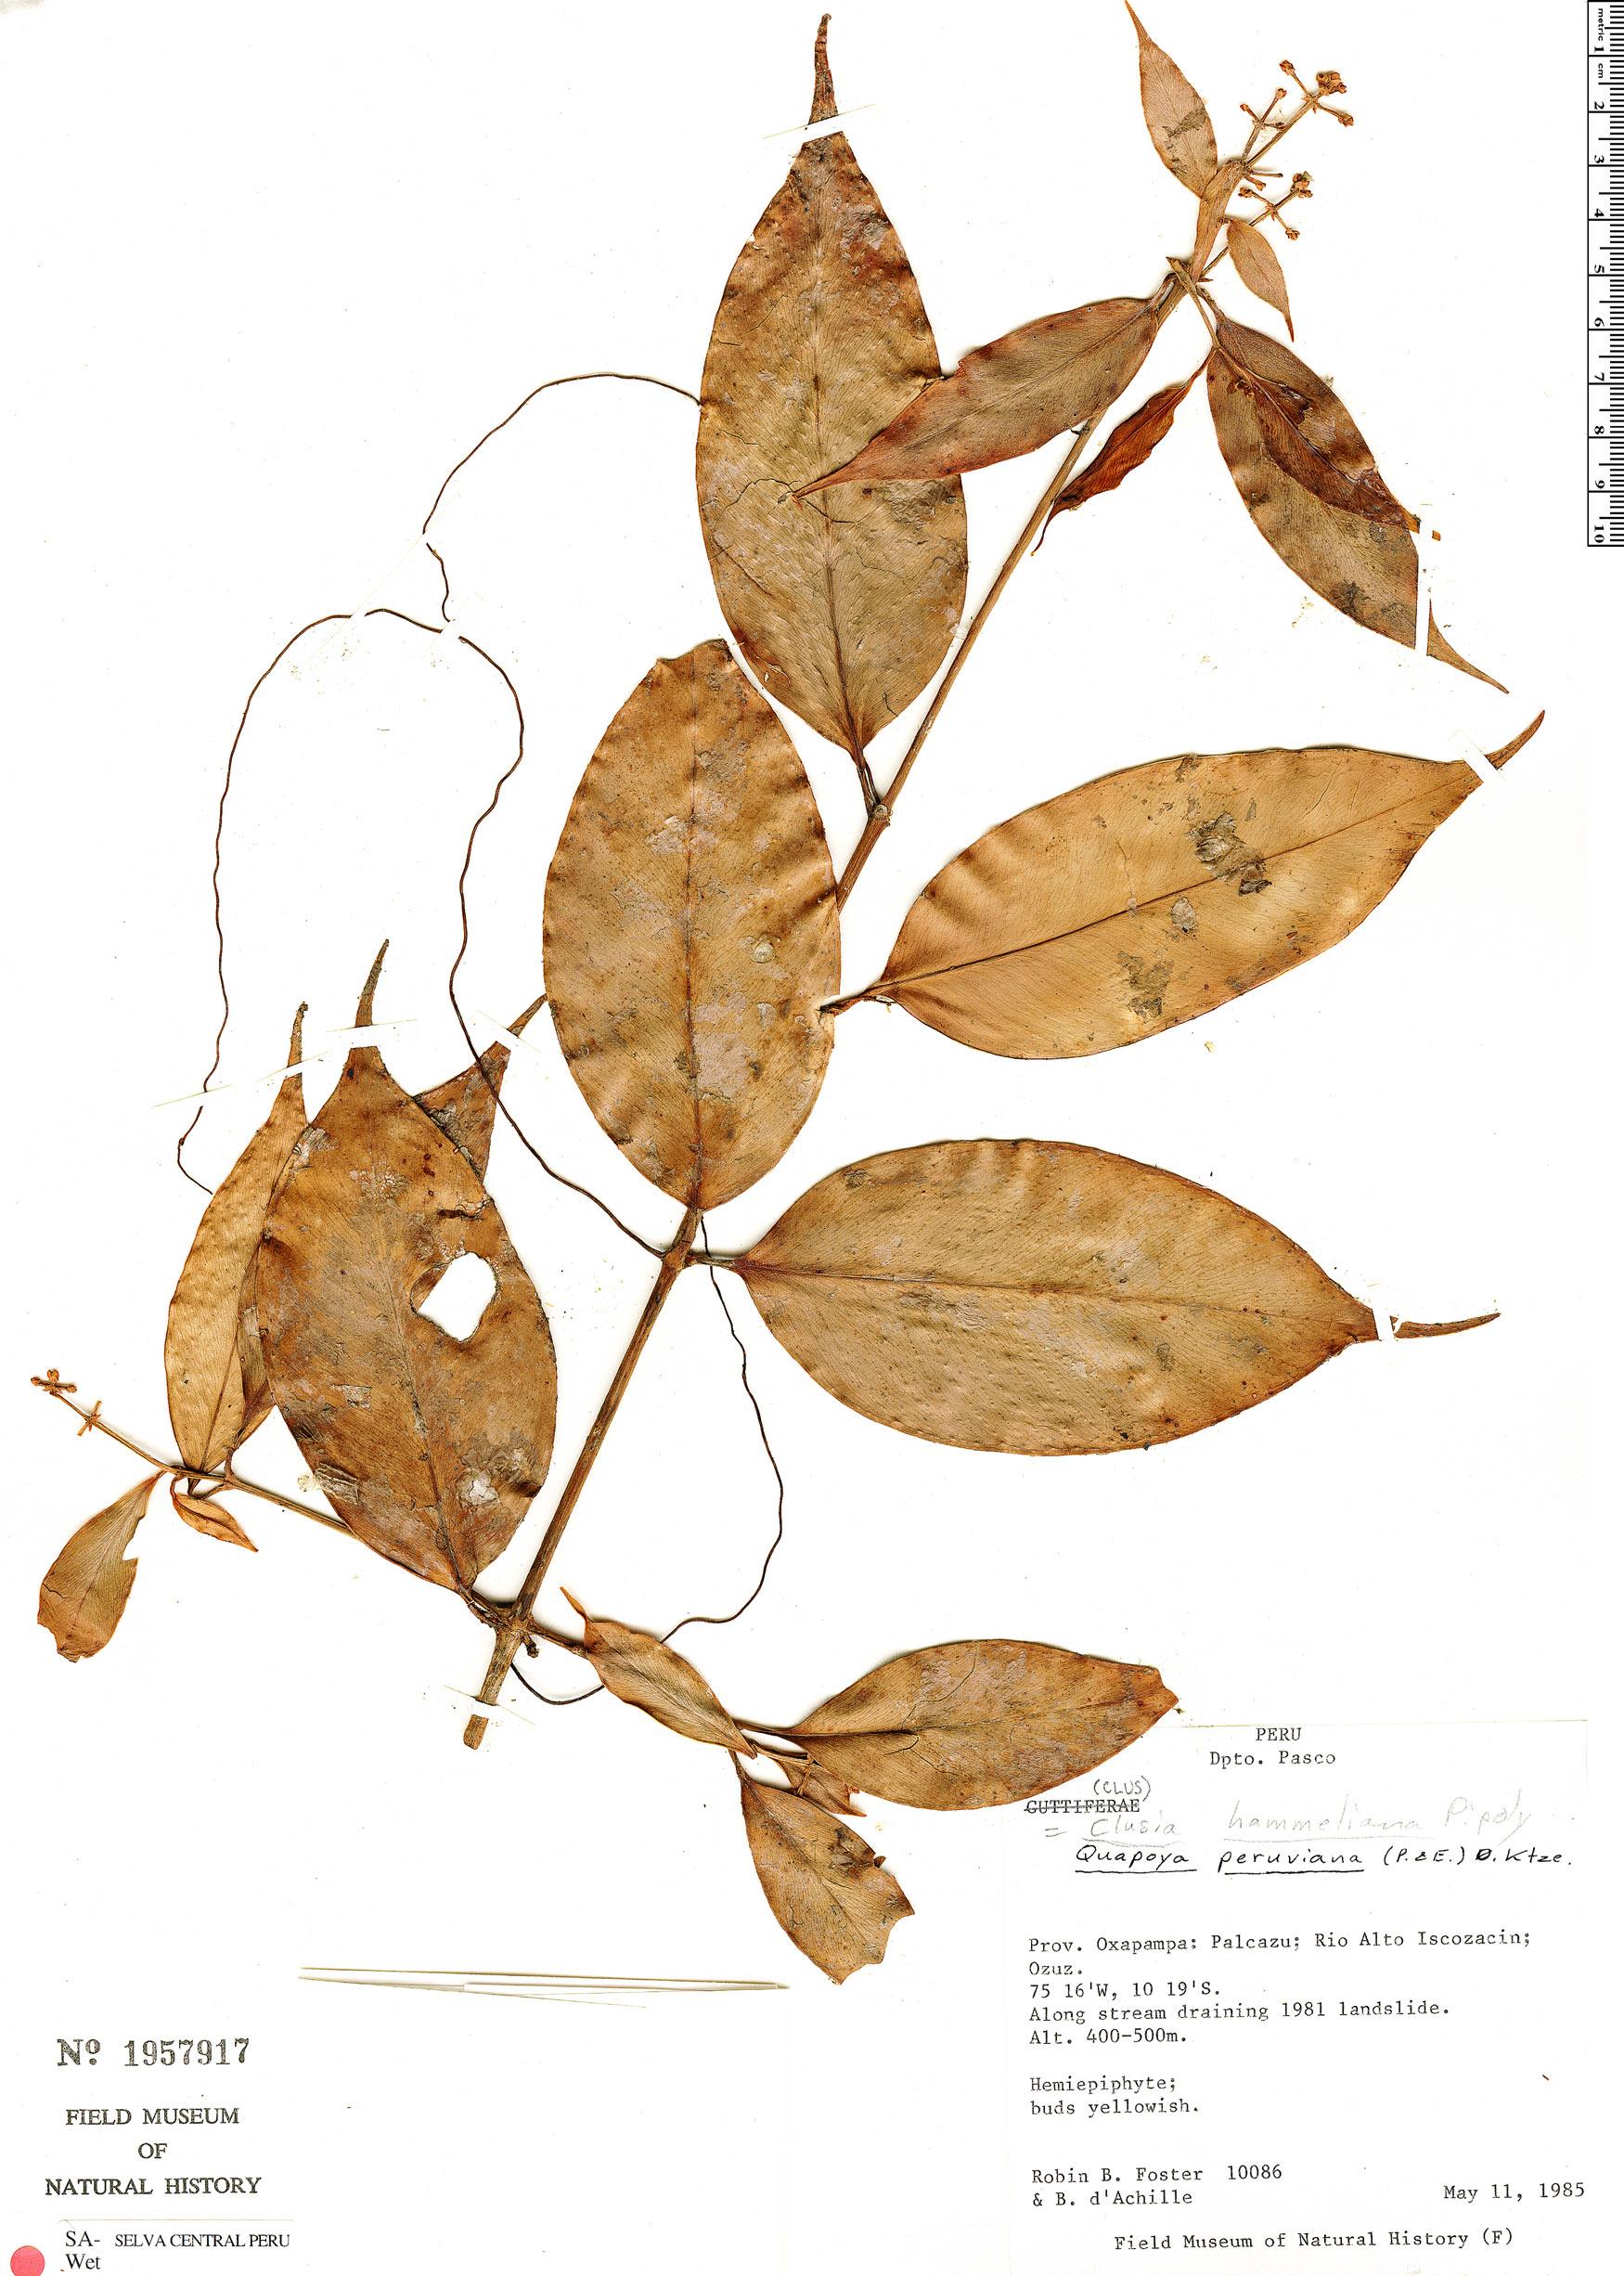 Espécime: Clusia hammeliana